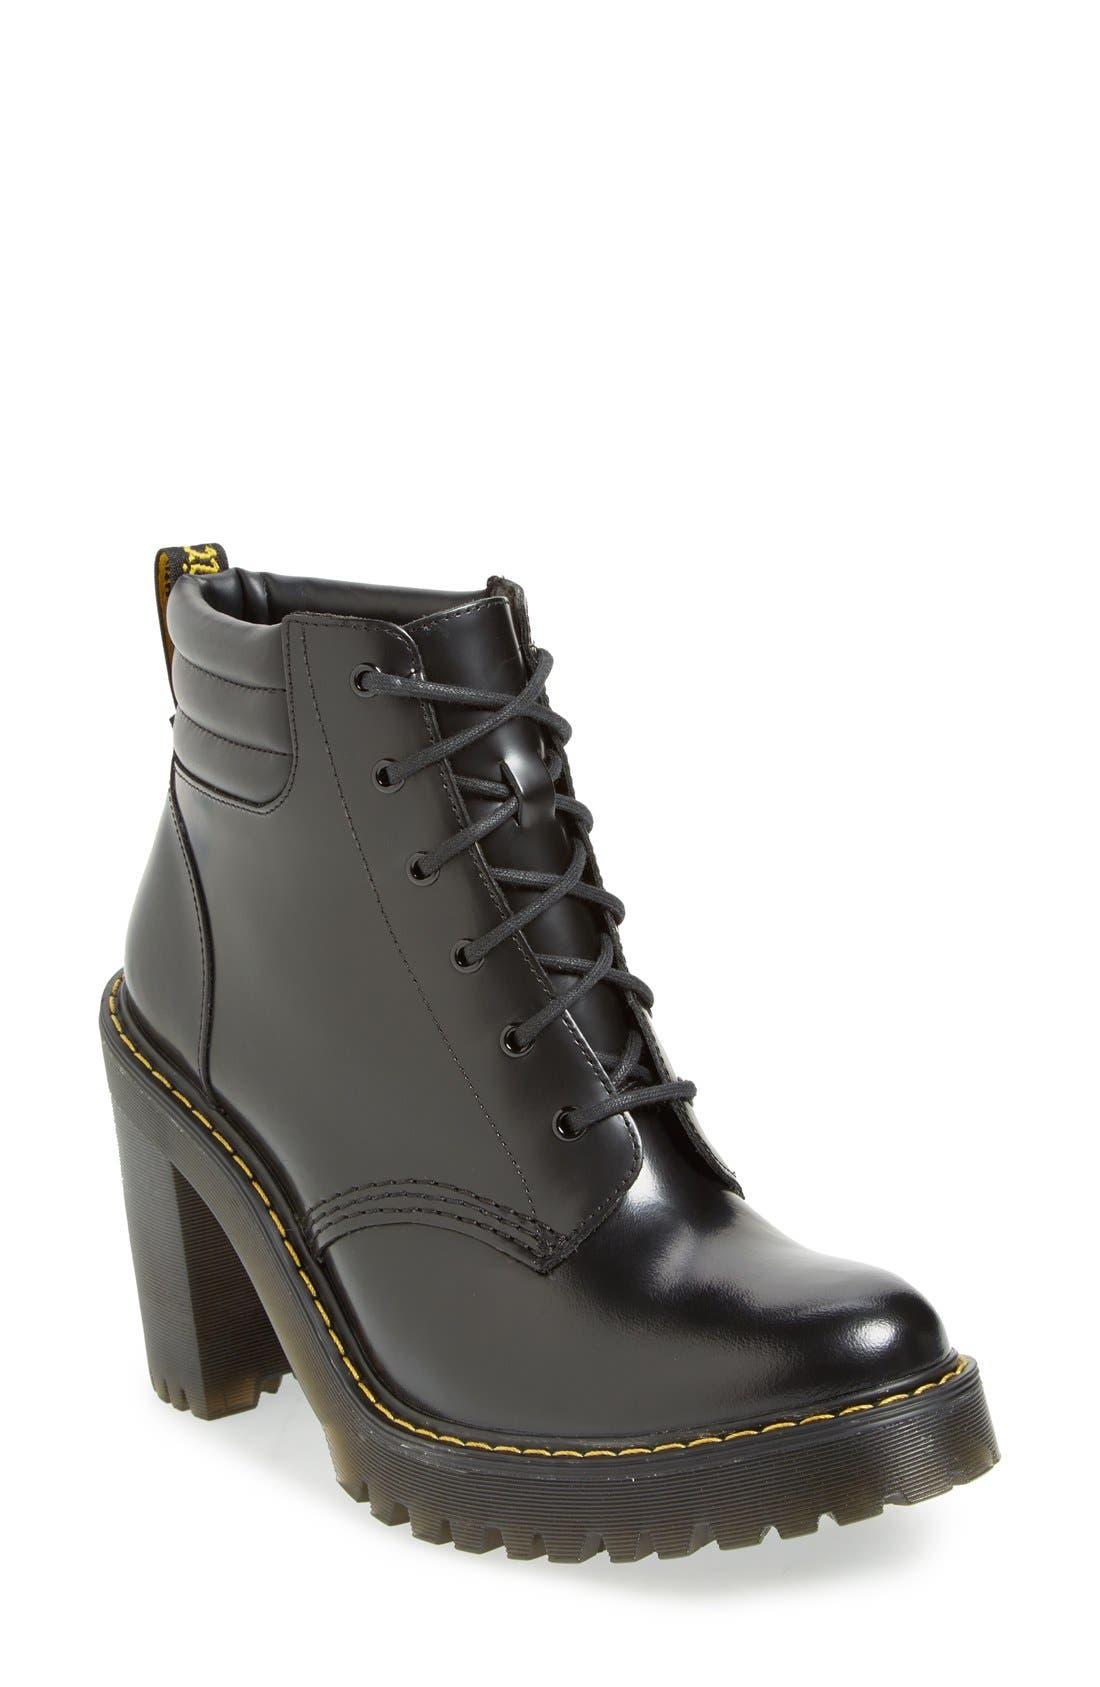 Alternate Image 1 Selected - Dr. Martens 'Persephone' Platform Boot (Women)